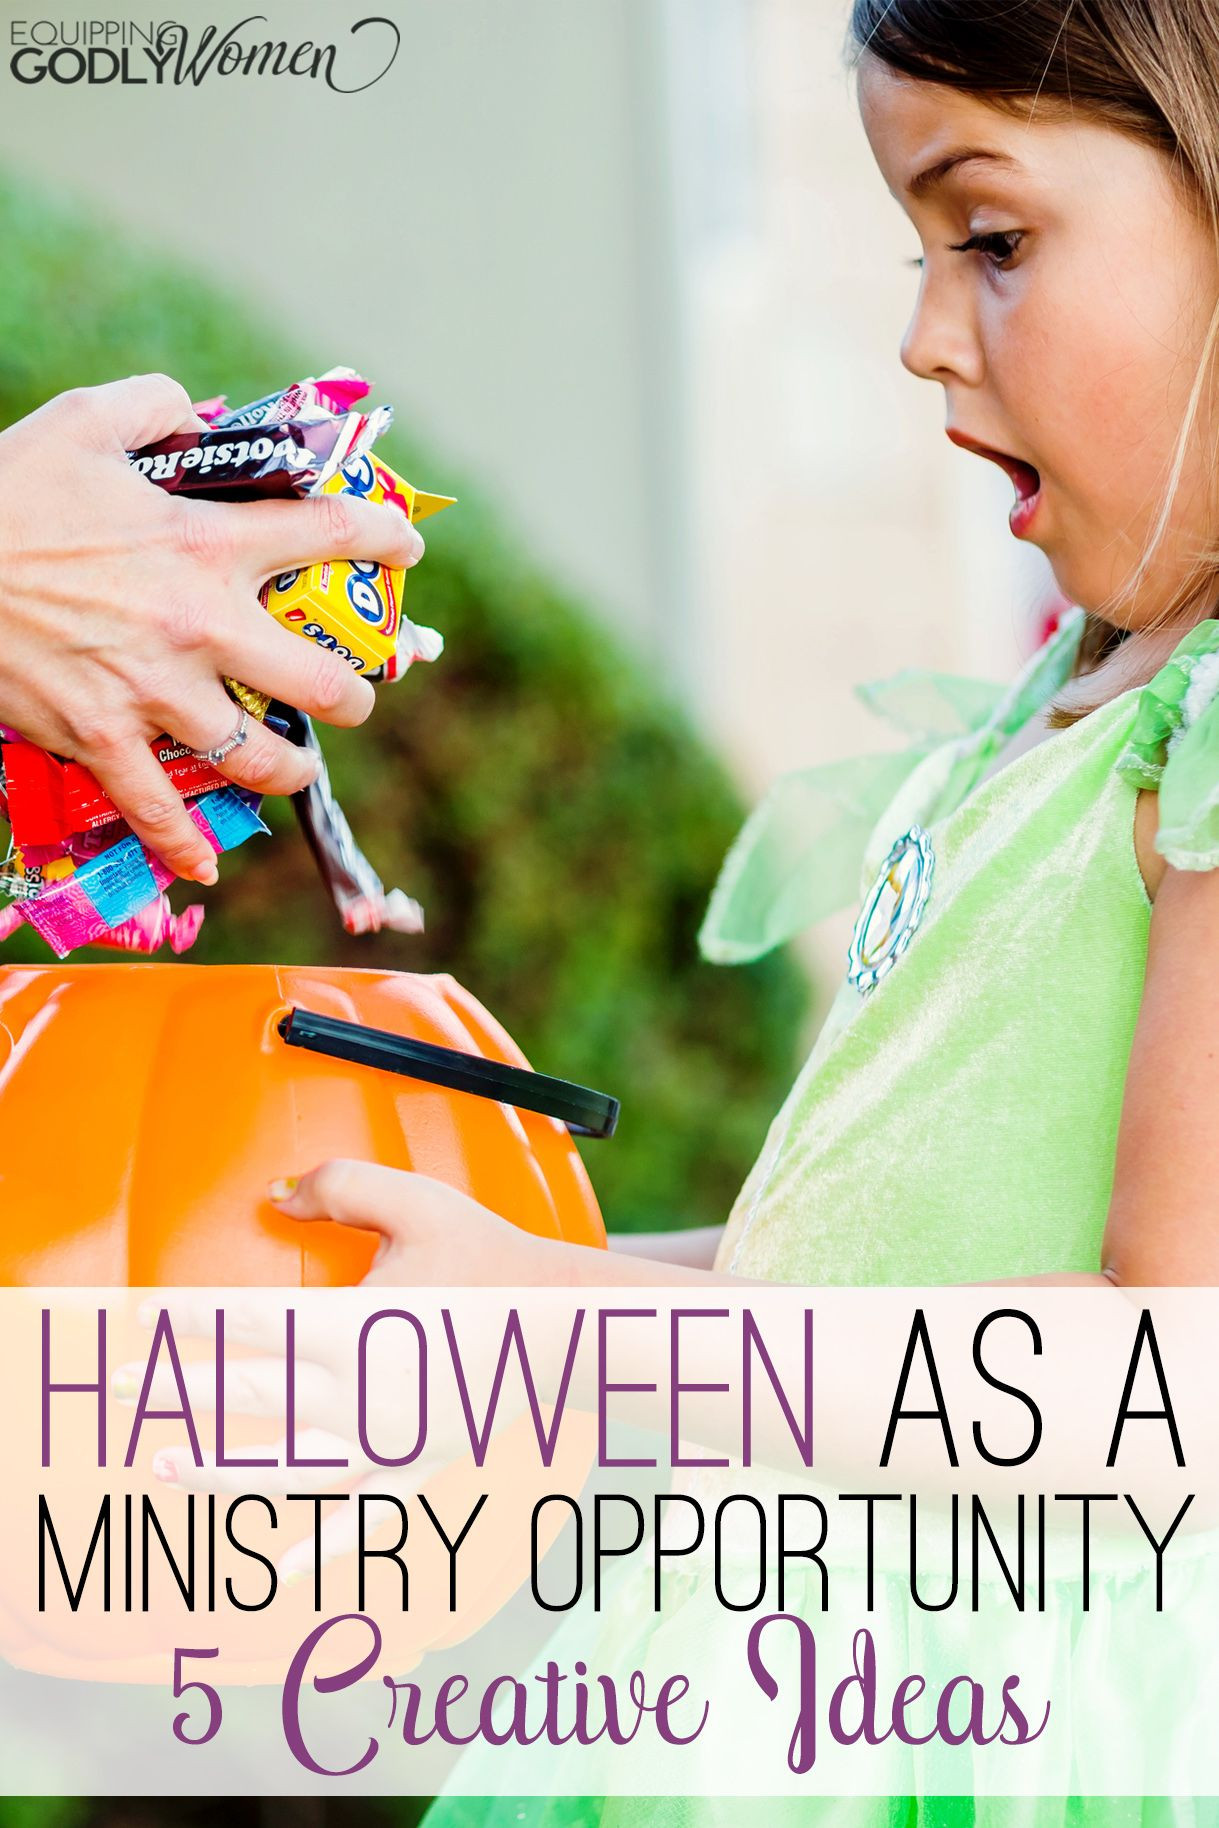 Christian Halloween Party Ideas  Halloween as a Ministry Opportunity 5 Creative Ideas